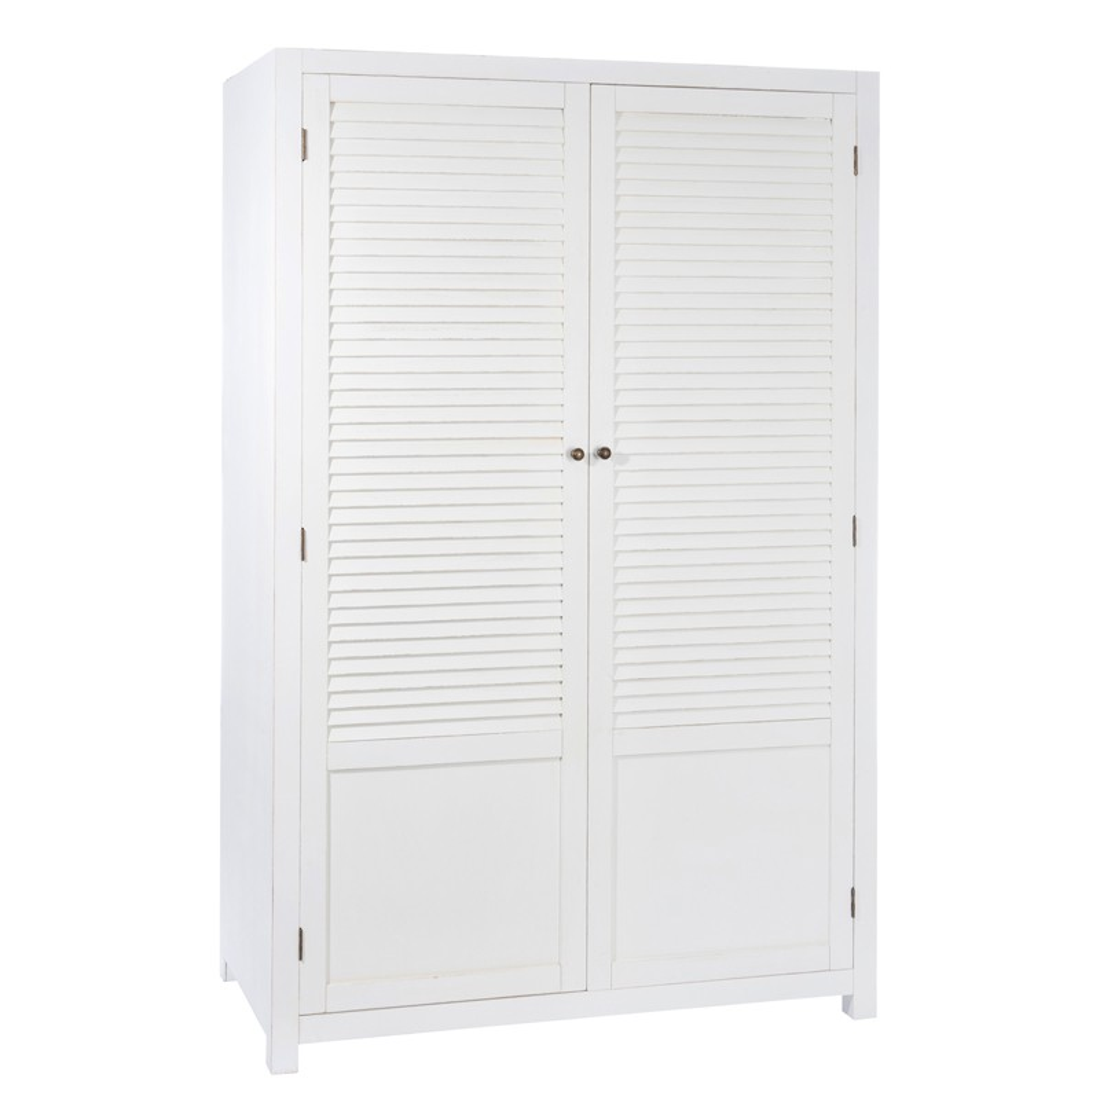 Chambre > Armoires > Armoire 2 portes Blanc  BOUDEBOIS